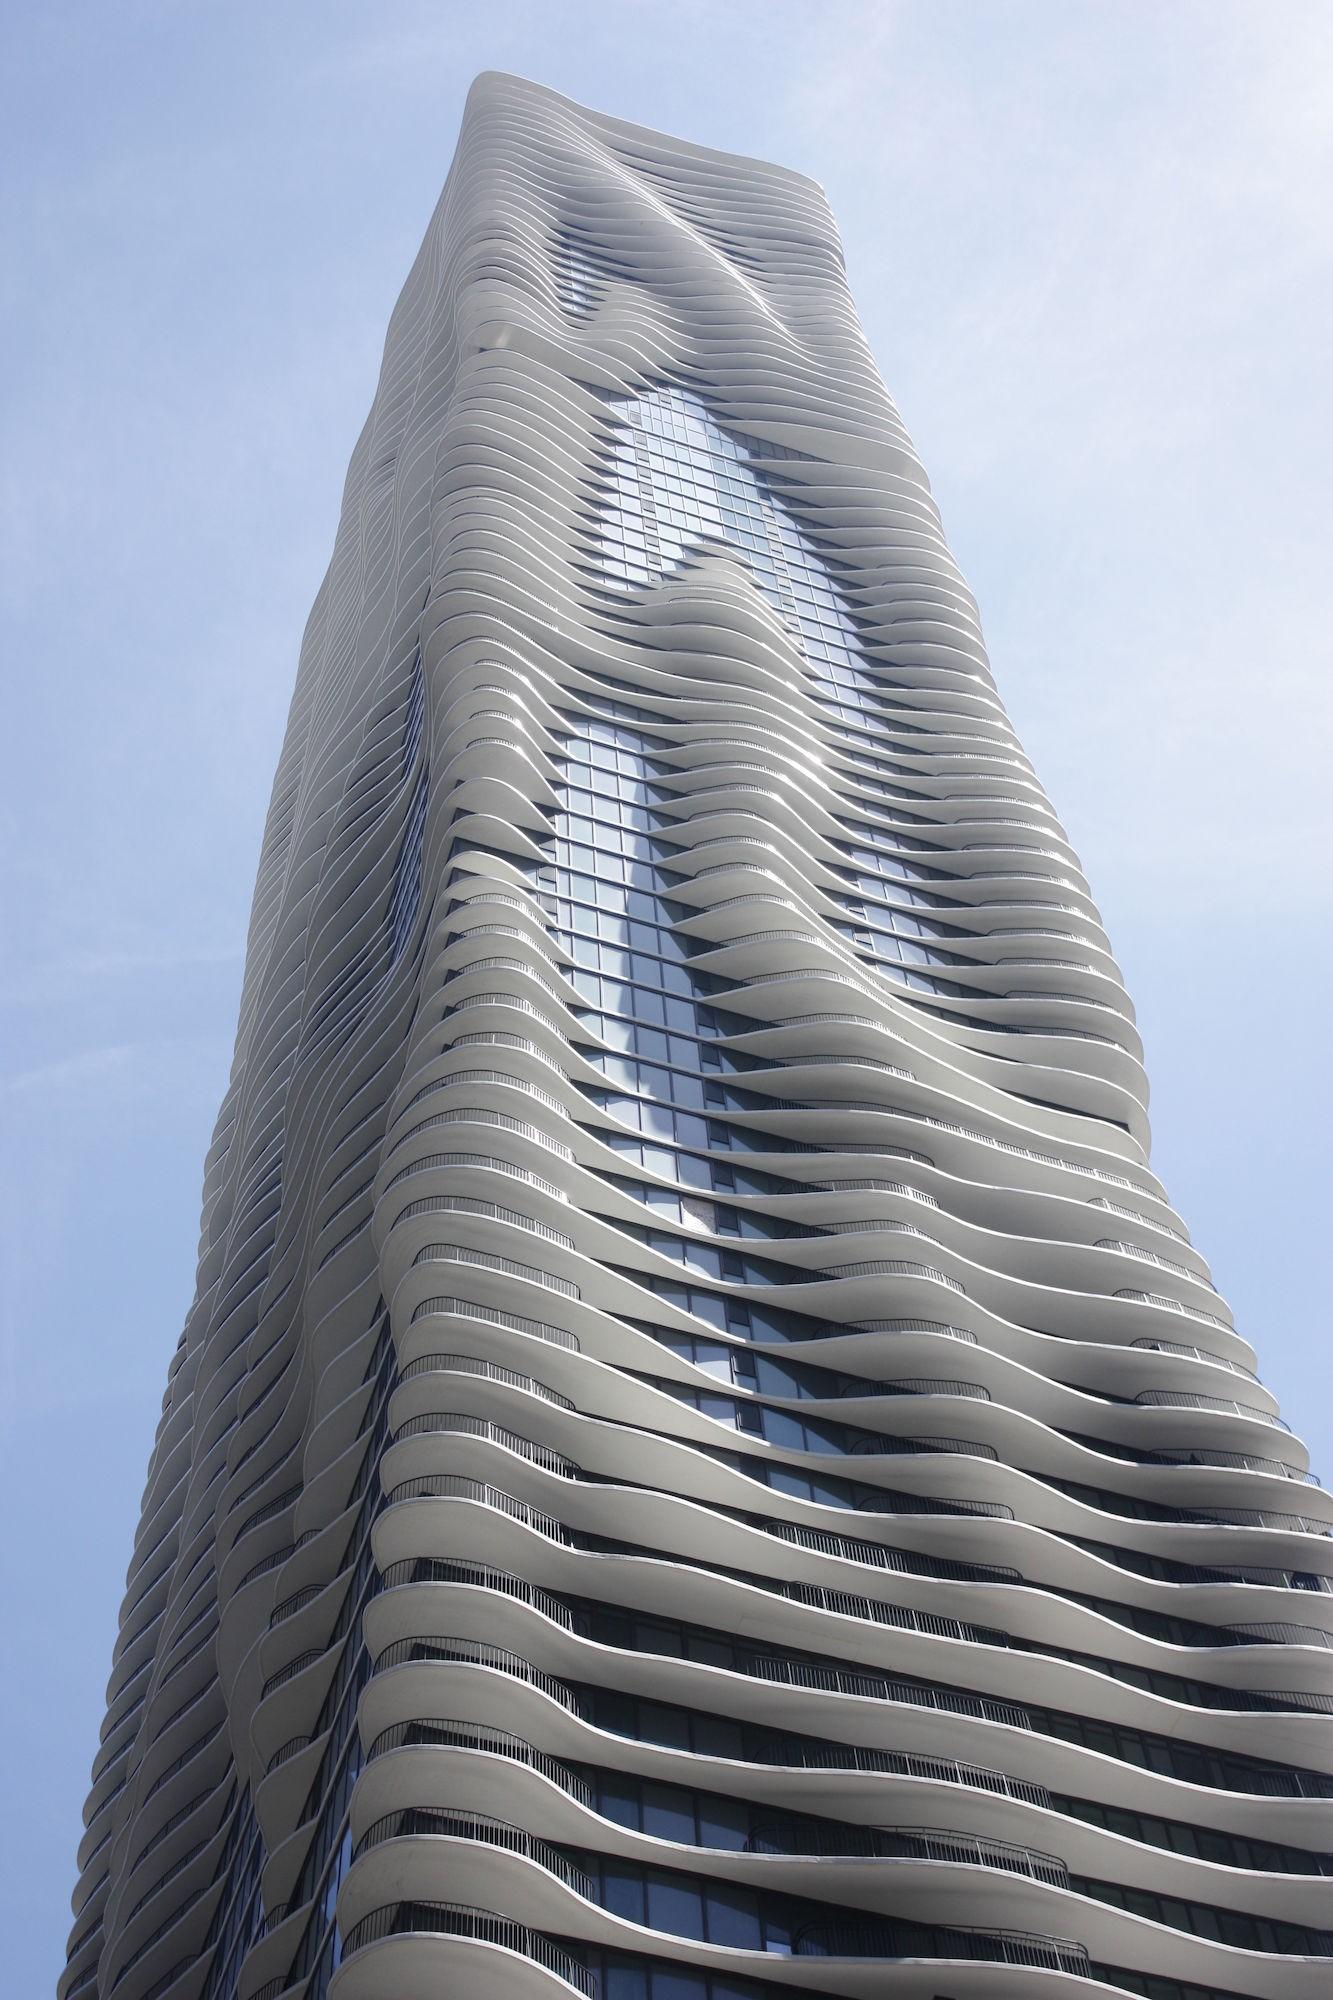 Home Design Architect Aqua 183 Buildings Of Chicago 183 Chicago Architecture Center